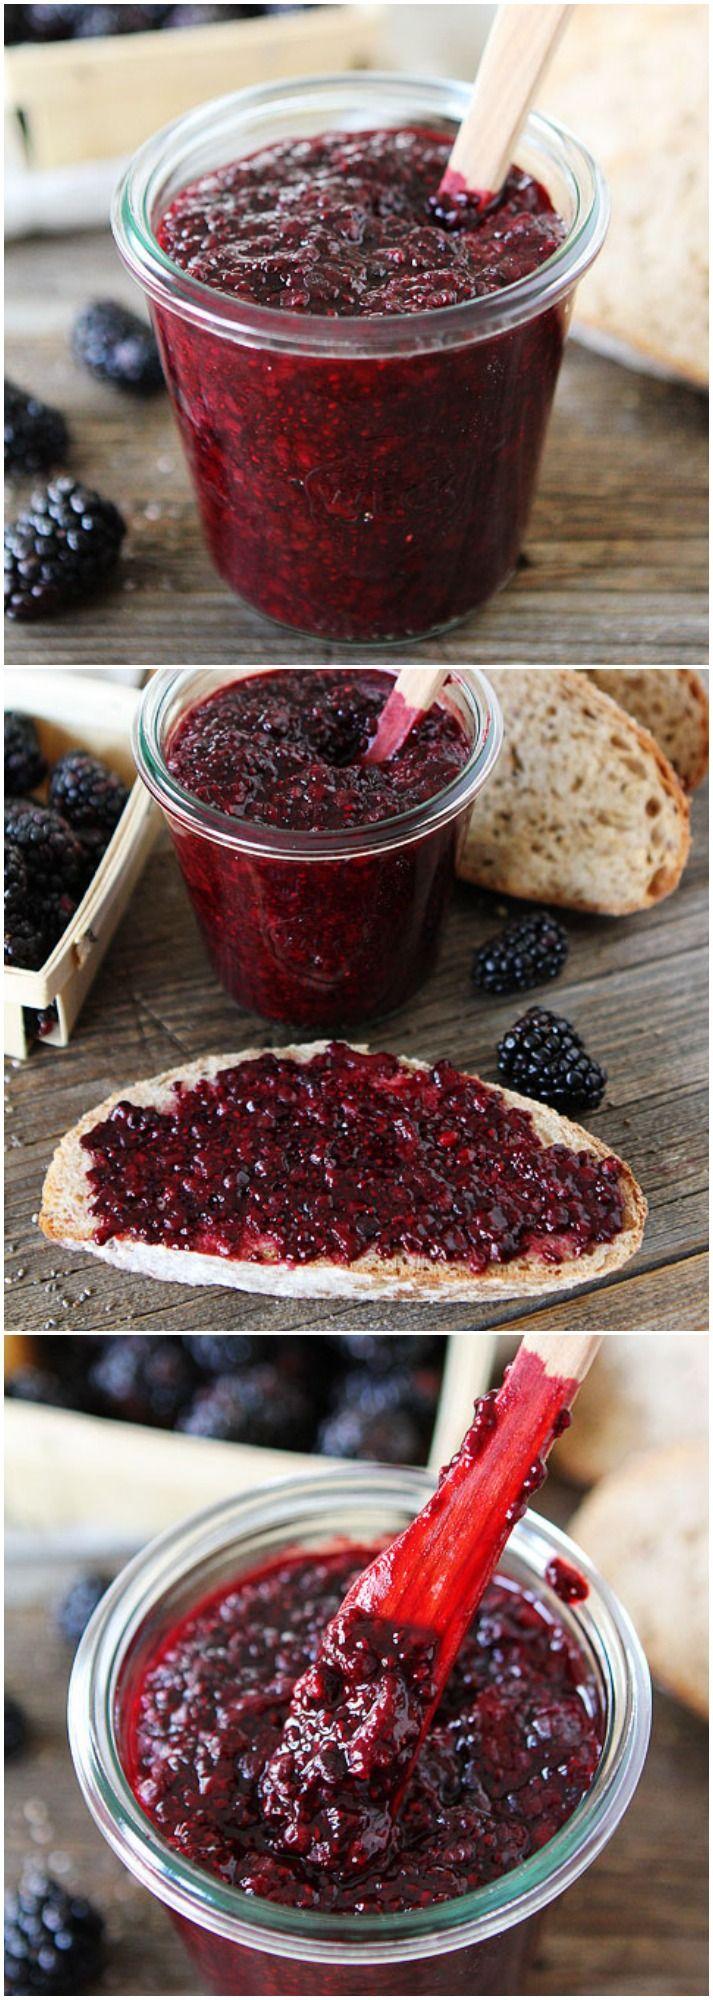 Blackberry Chia Seed Jam on twopeasandtheirpod.com Homemade healthy jam in 20 minutes!